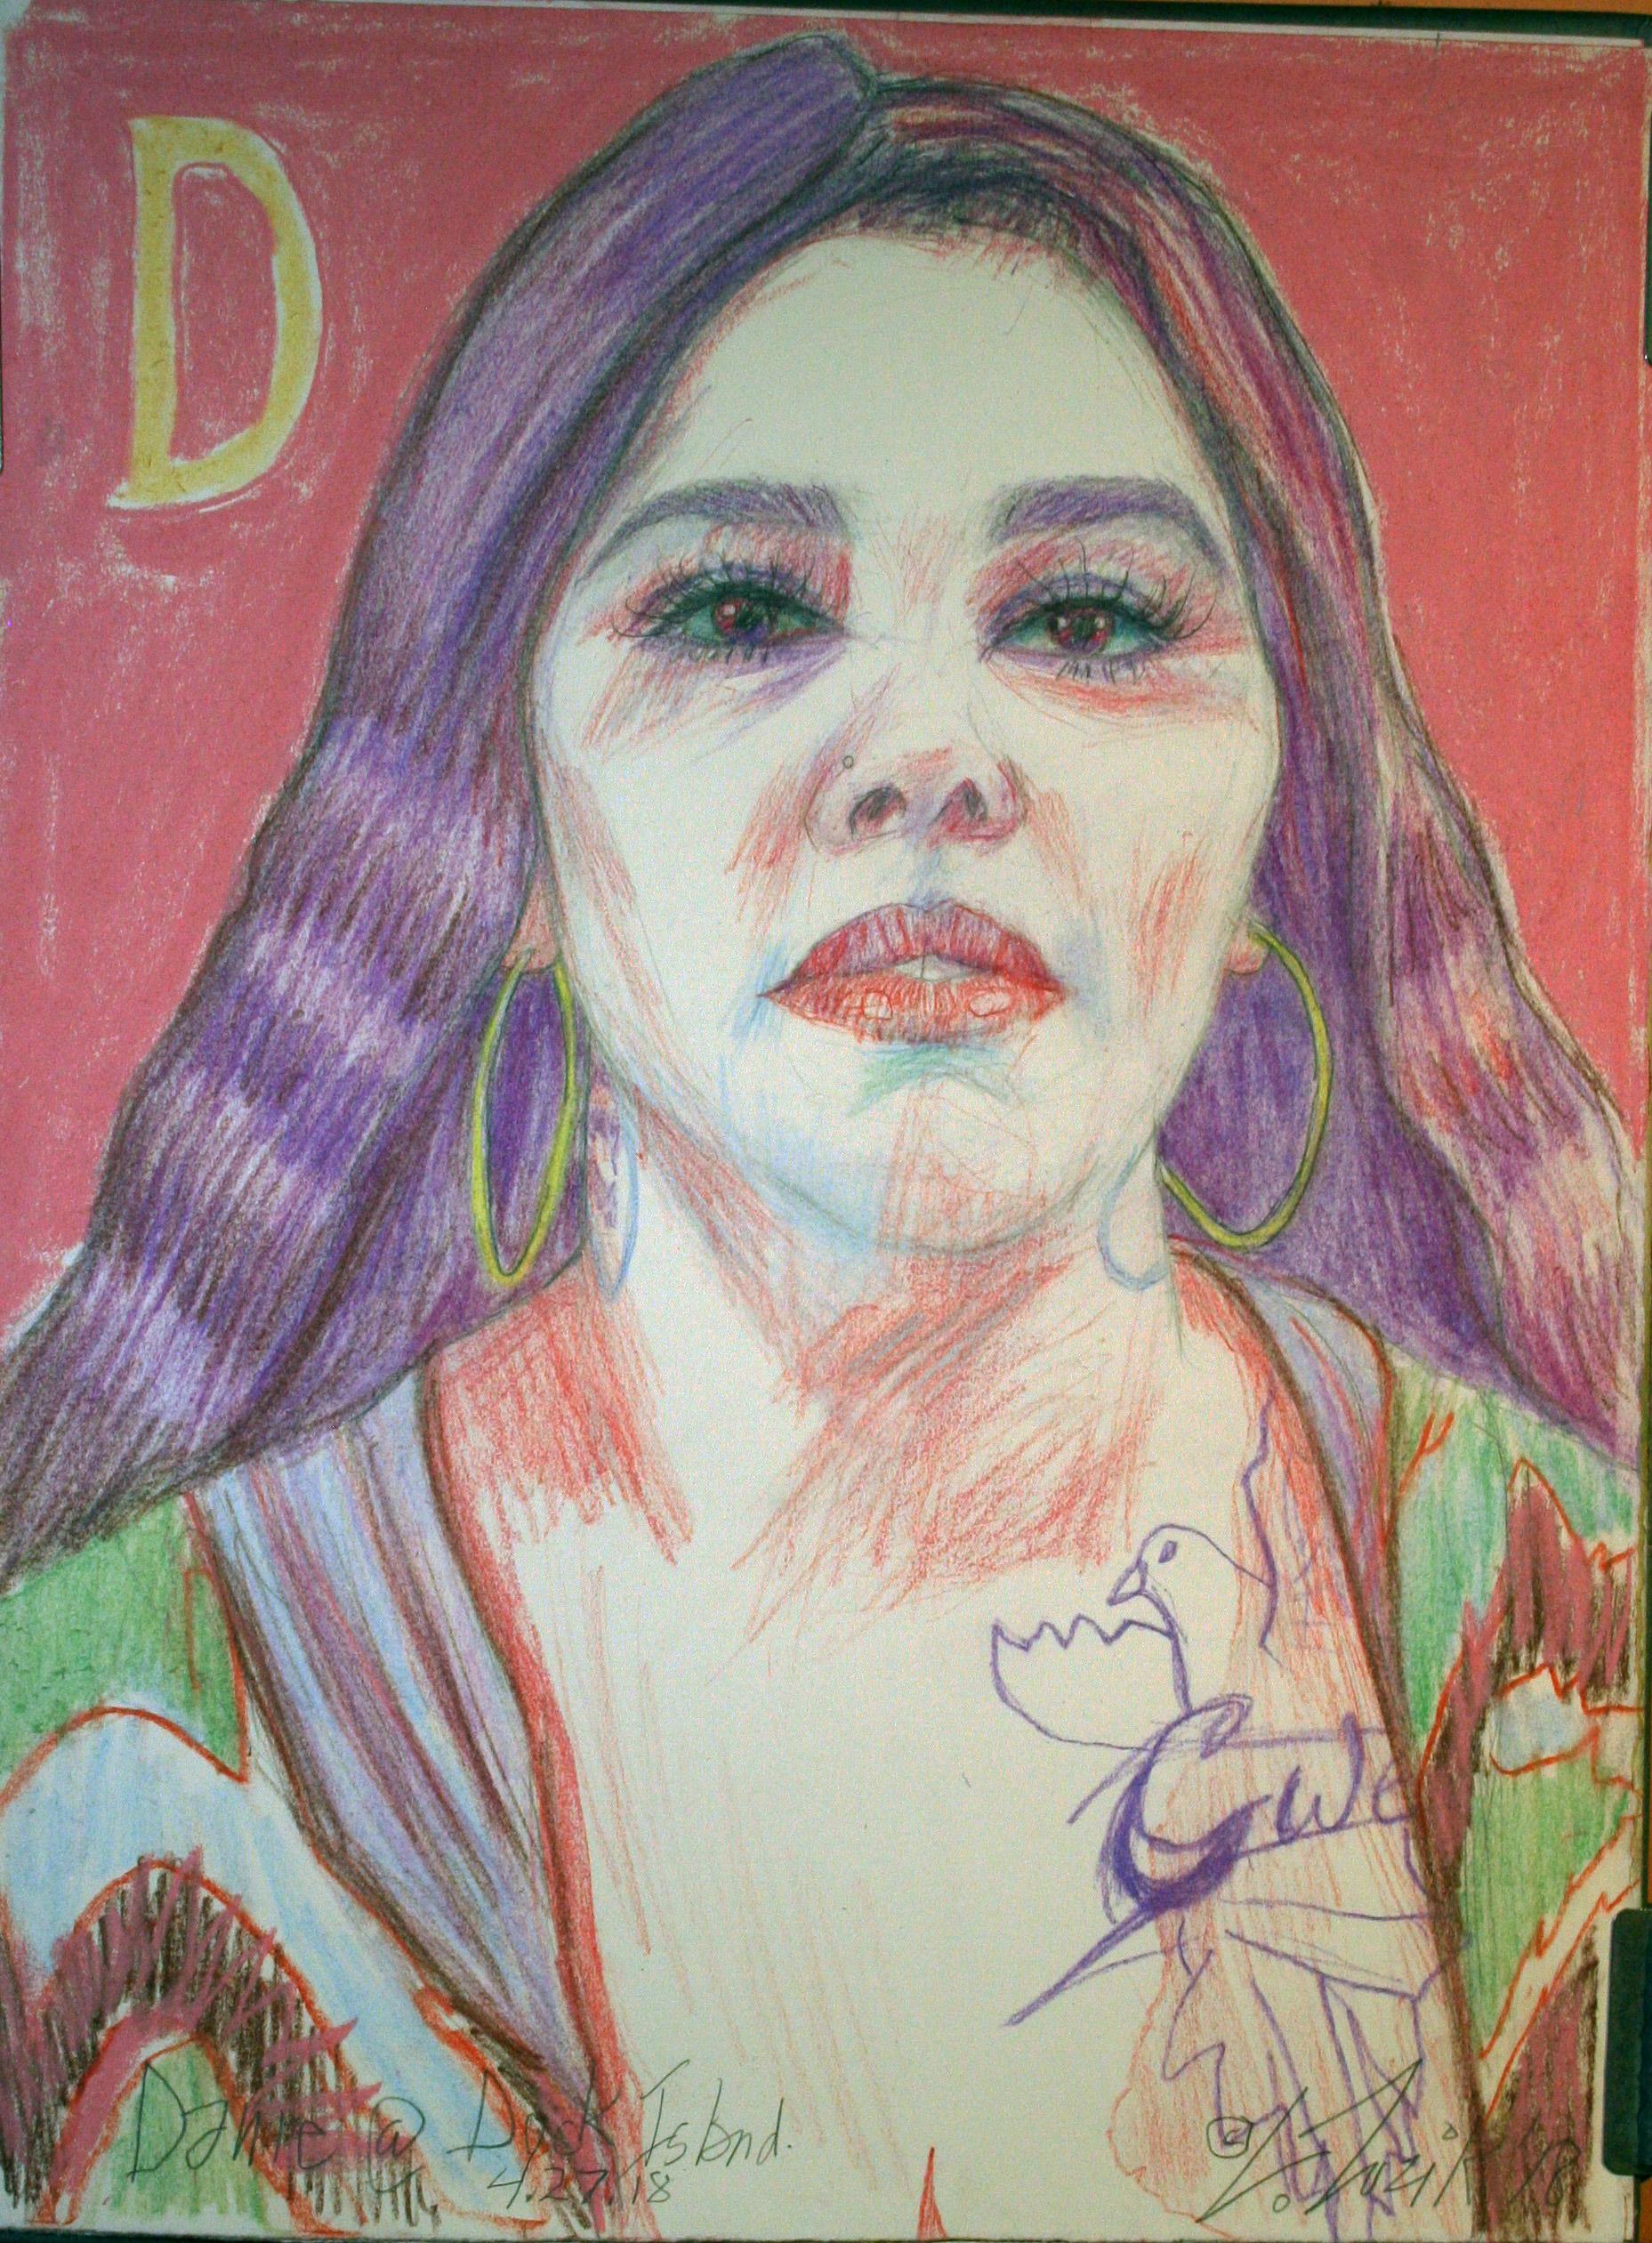 Larry Zuzik did this pastel drawing.